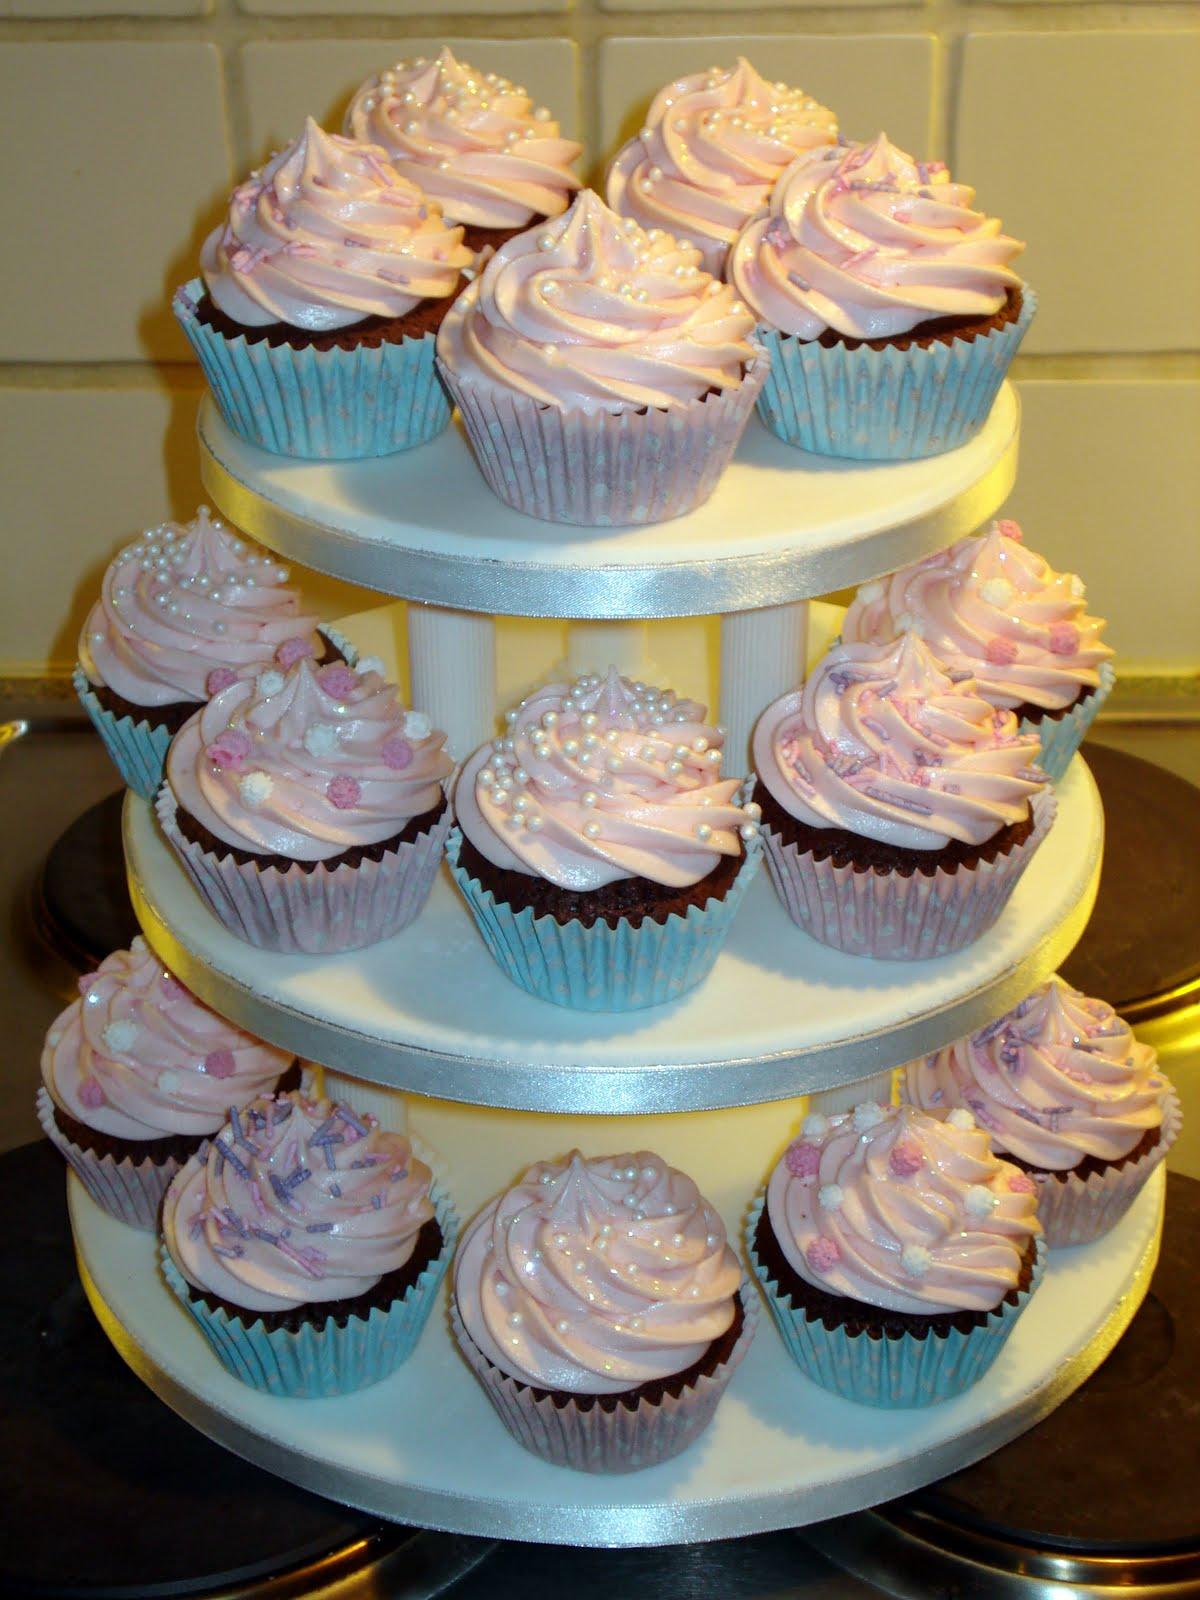 Custom Cake Designs Uk : Custom Cake Design: Chocolate/Strawberry tower